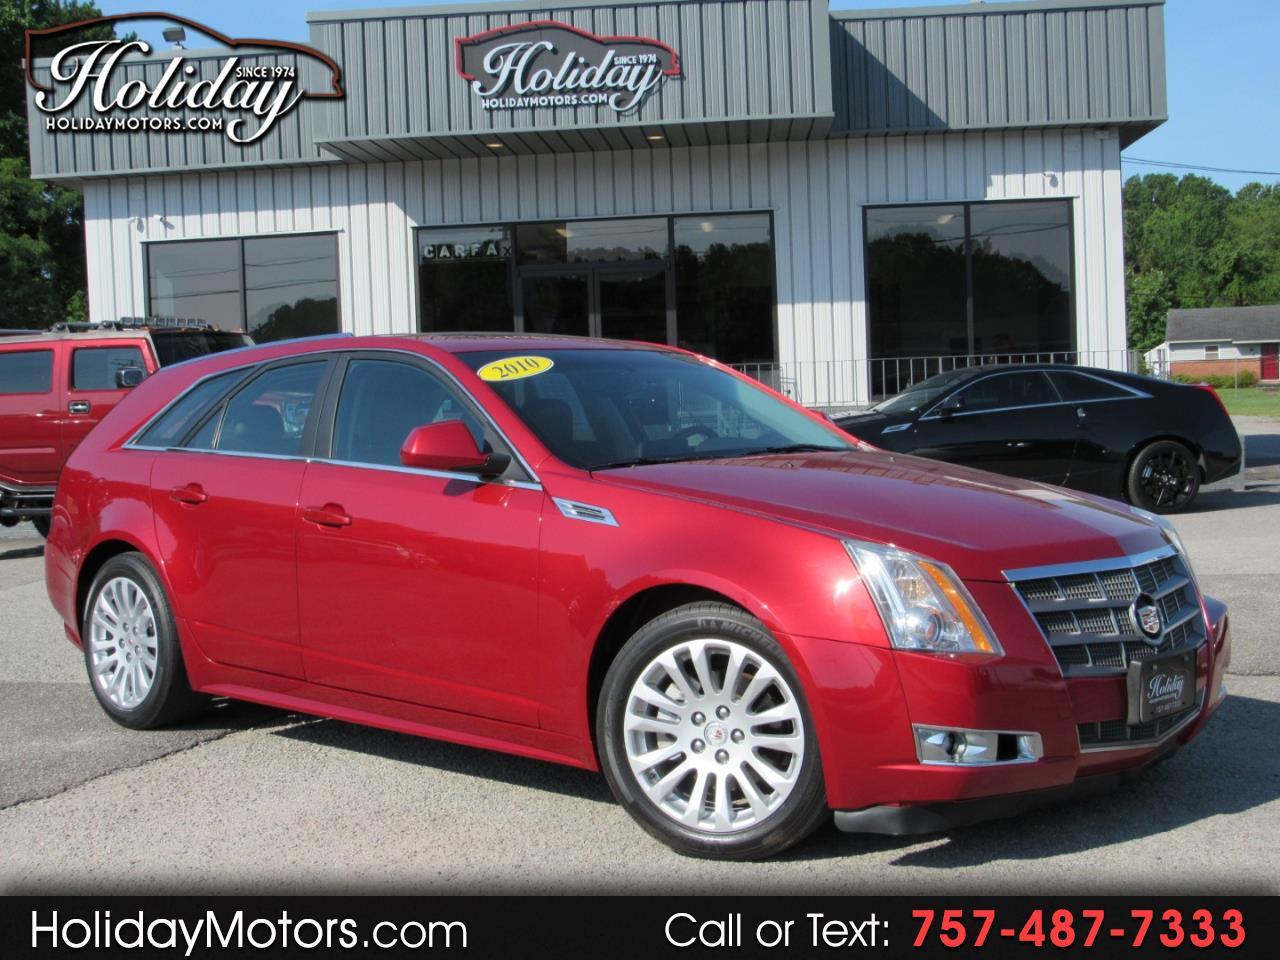 2010 Cadillac CTS Wagon 5dr Wgn 3.6L Premium RWD